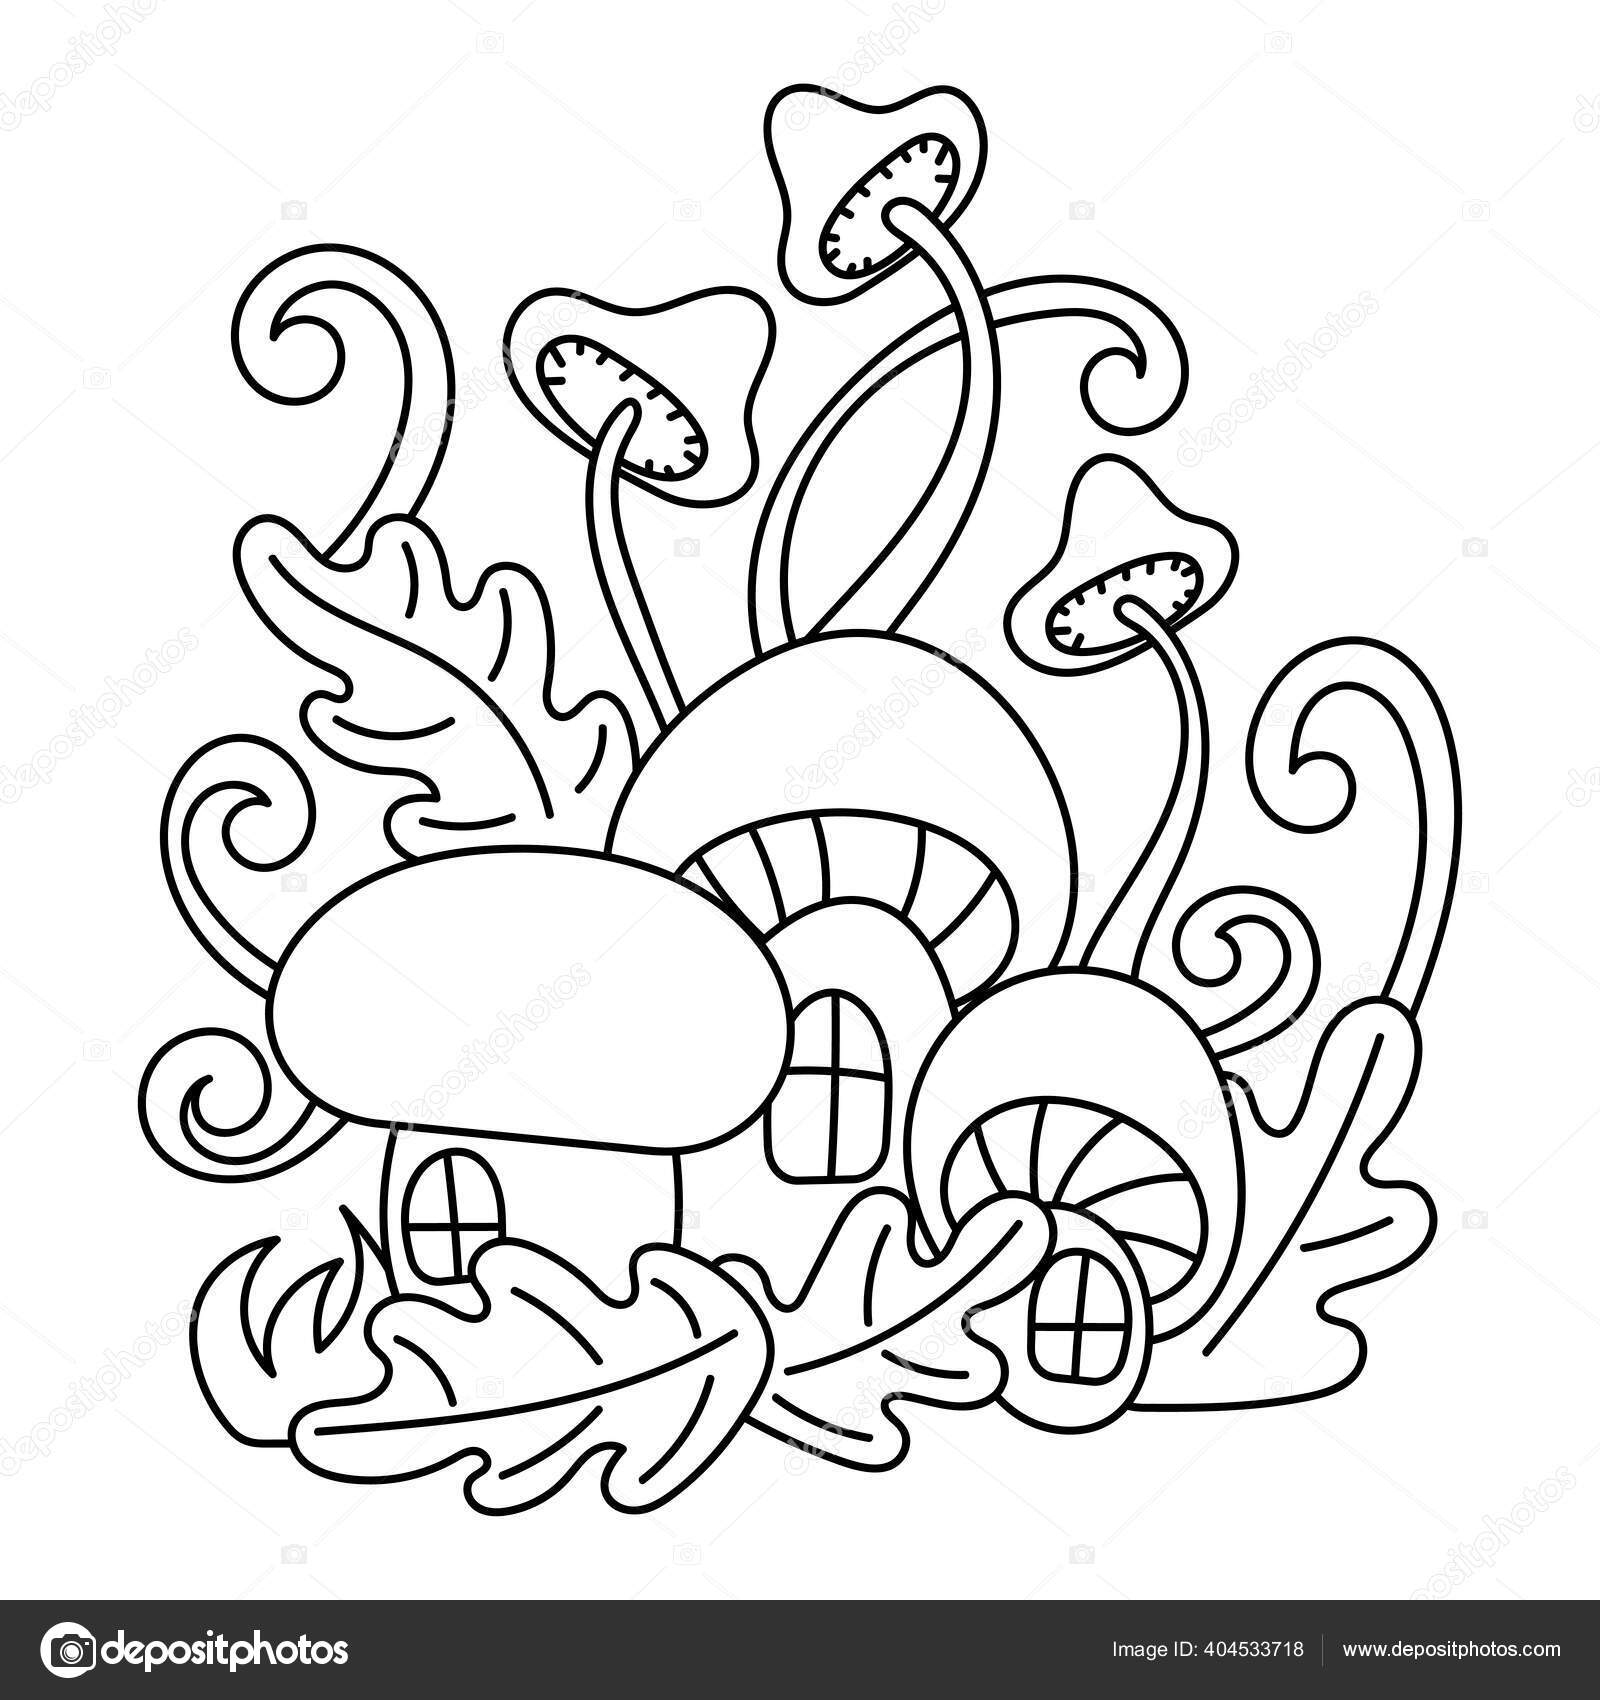 Jamur Rumah Hutan Ajaib Tanaman Dan Daun Doodle Ilustrasi Buku Stok Vektor C Axenova N Yandex Ru 404533718